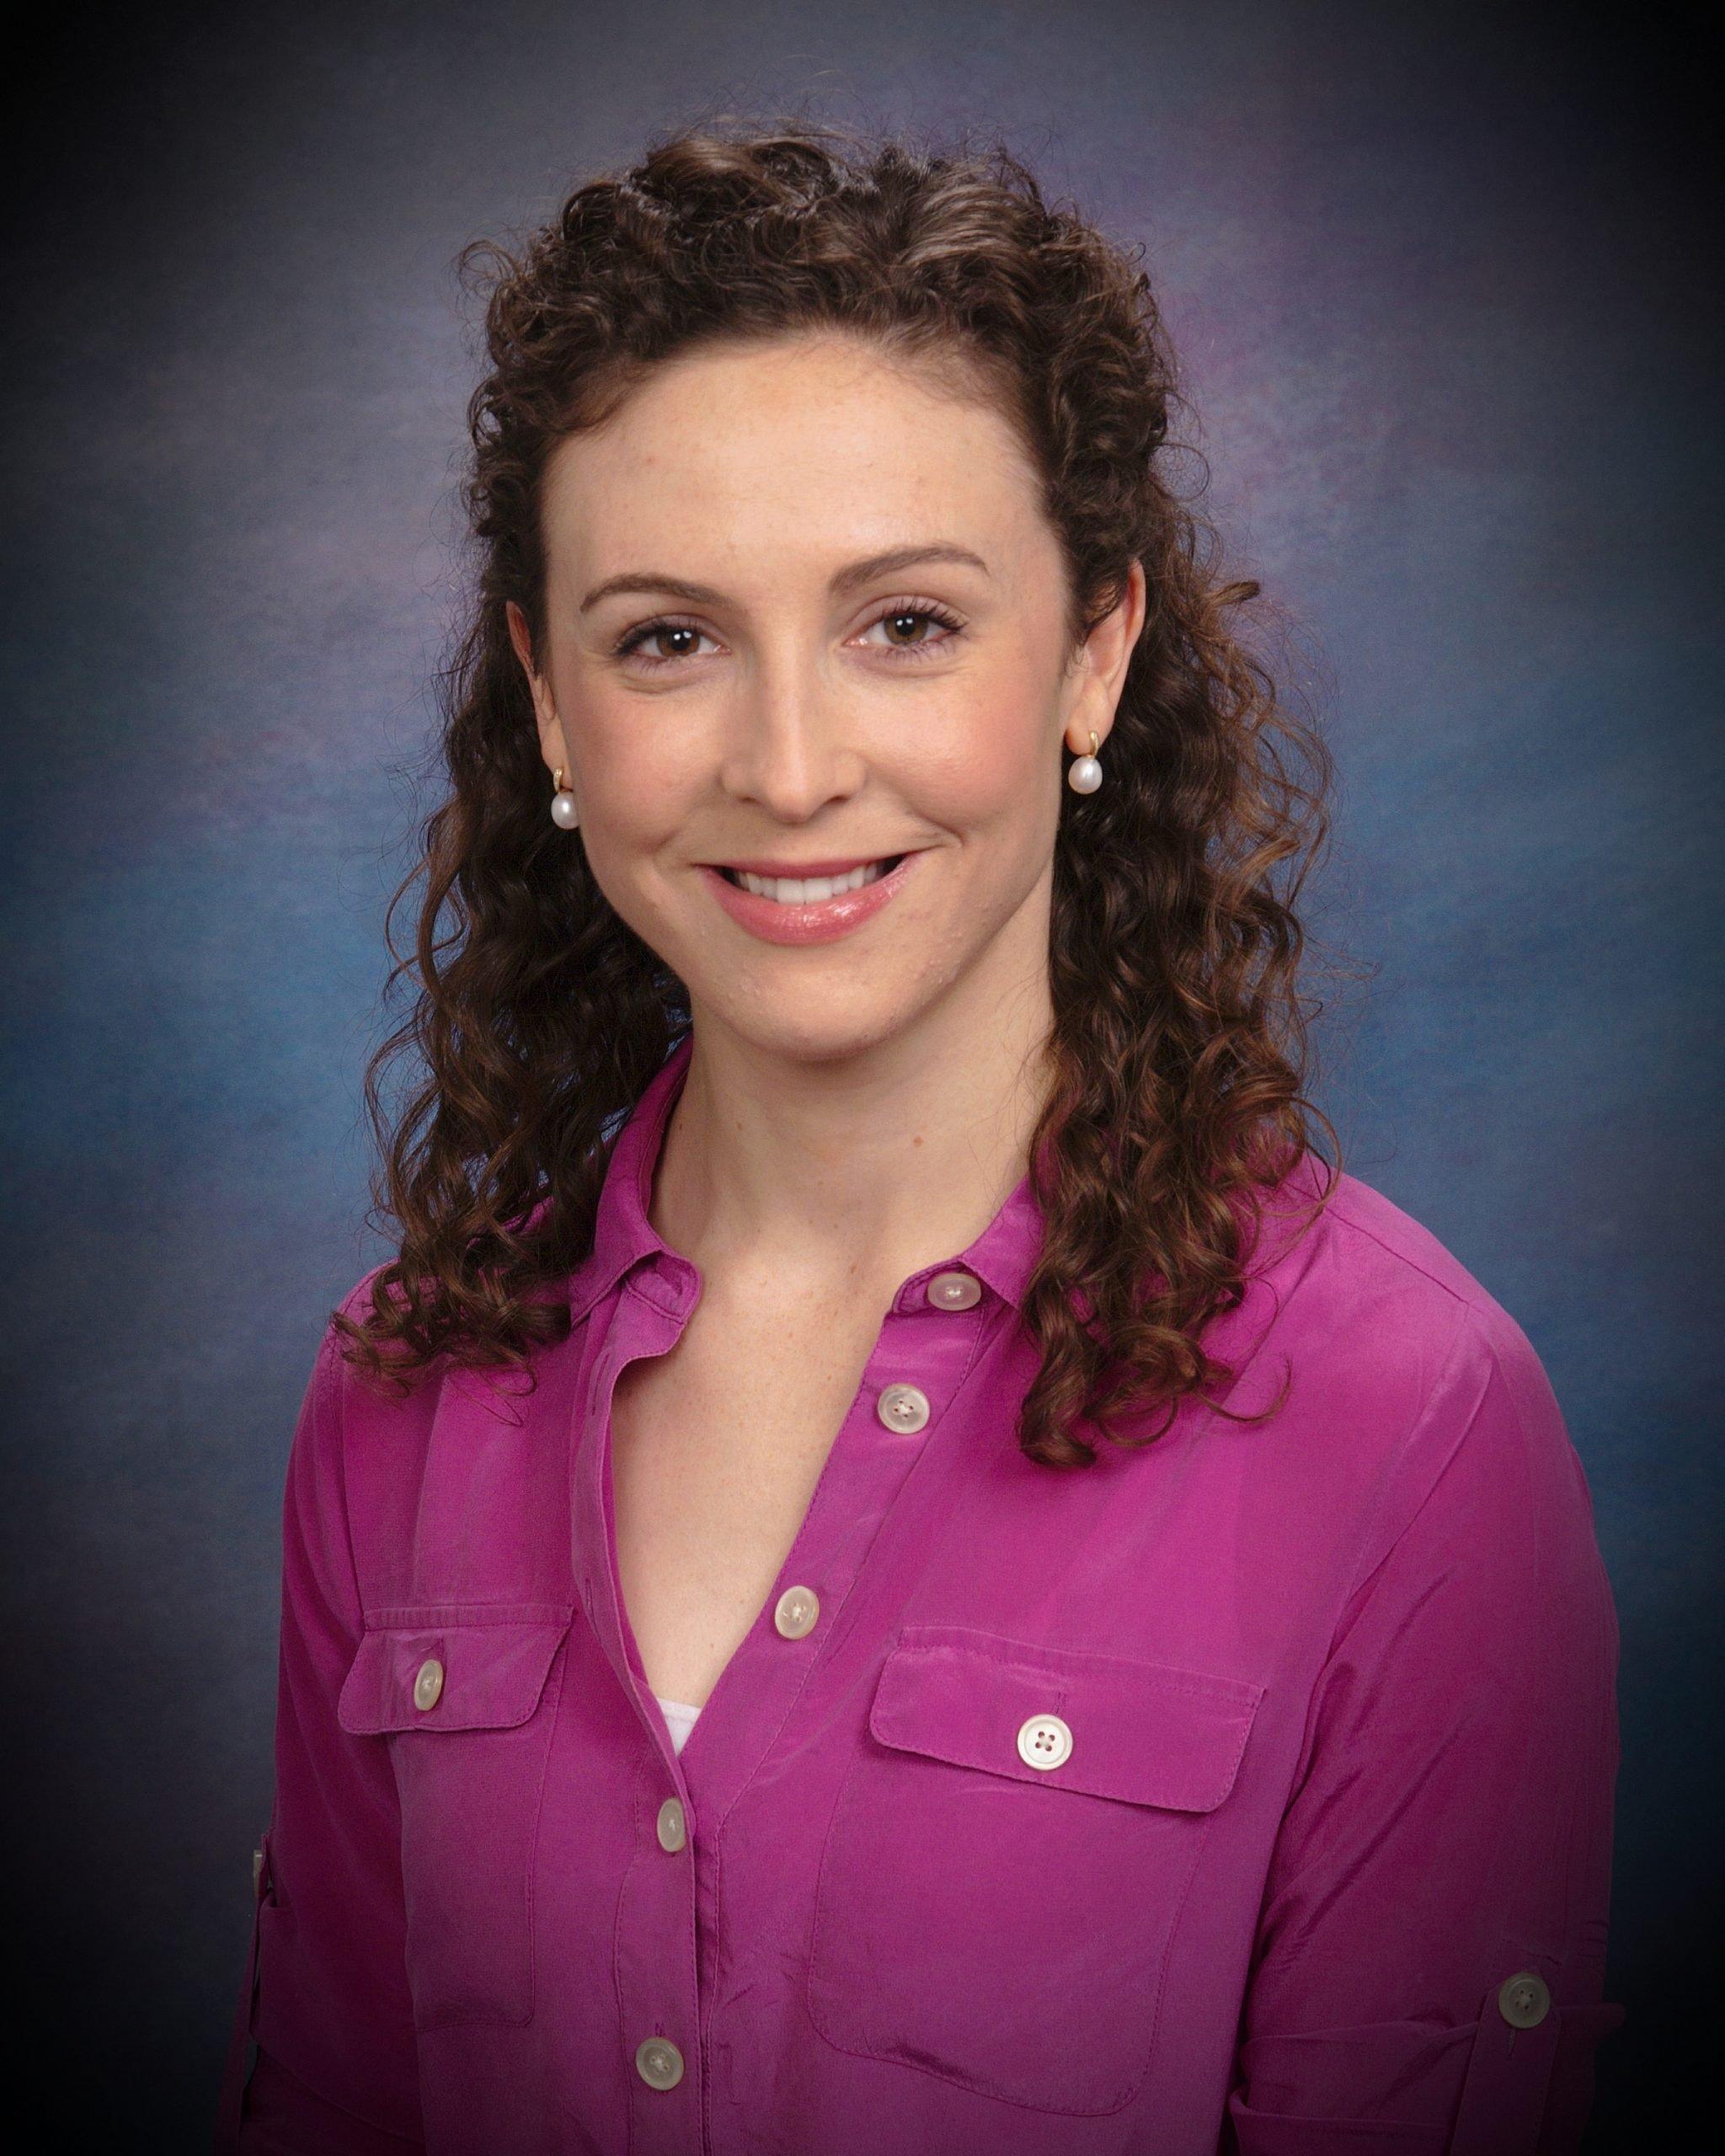 Dr. Alison Ramsden